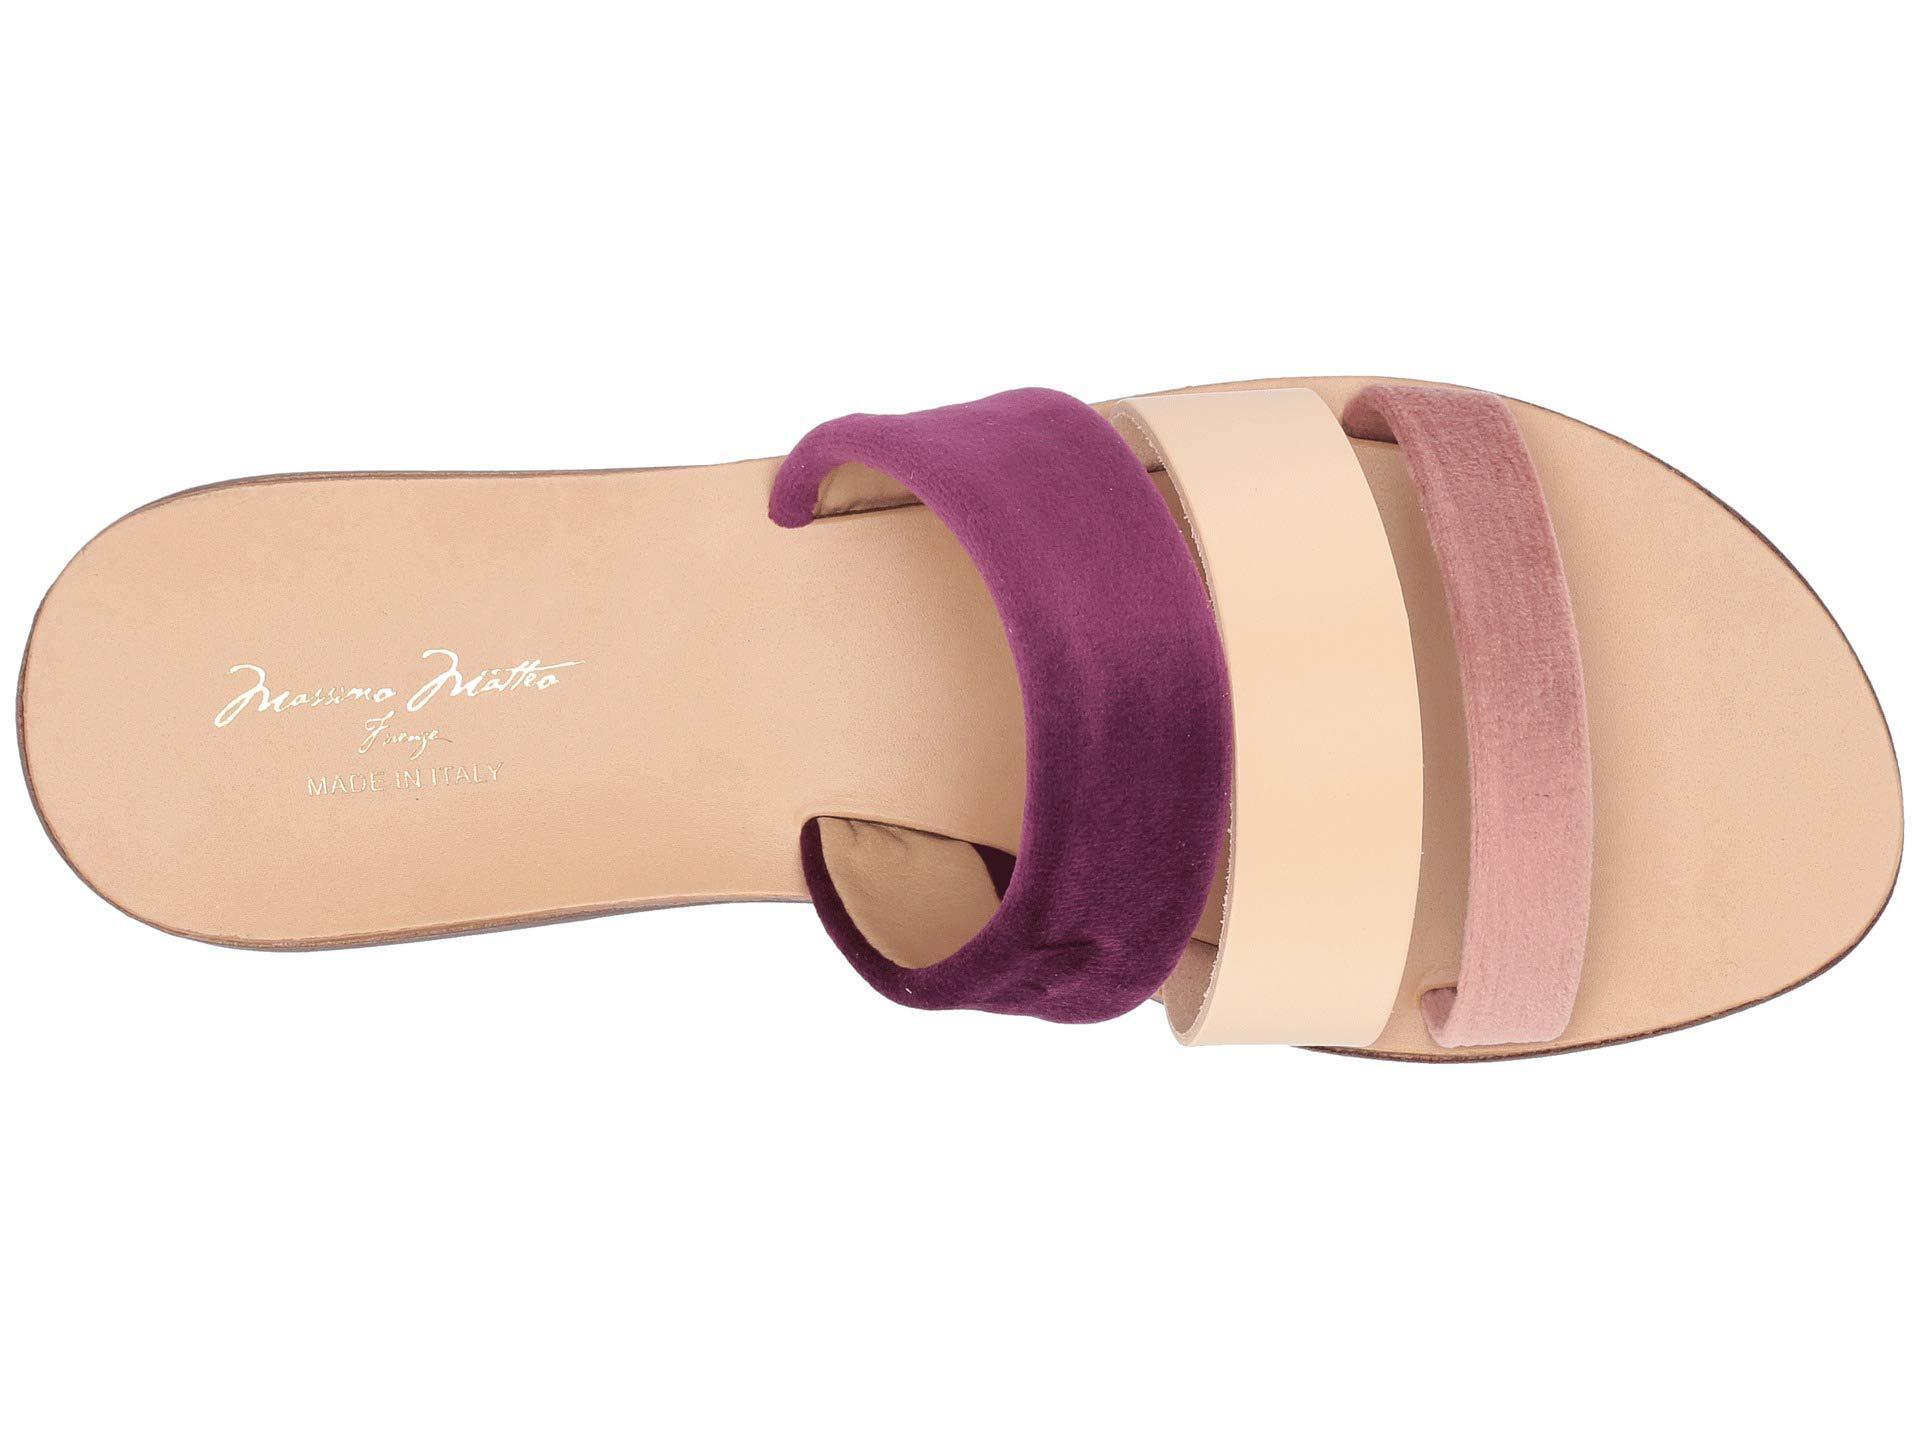 14214866fefd Massimo Matteo - Multicolor 3 Band Sandal (rosa chiaro) Women s Sandals -  Lyst. View fullscreen